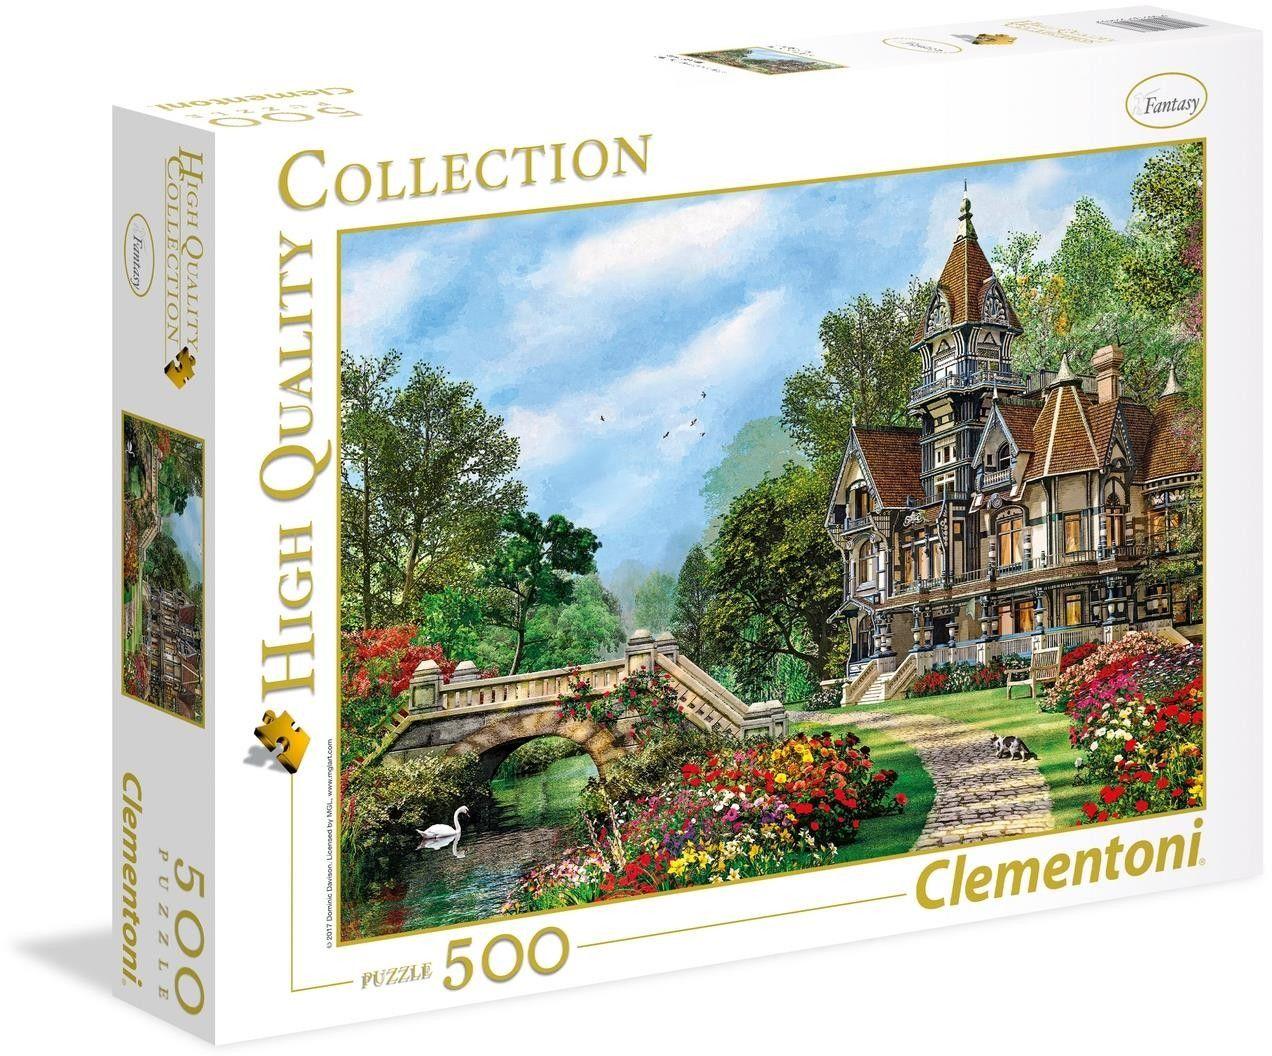 Clementoni - Clementoni Museum Collection Mona Lisa Leonardo 500 el. 30363